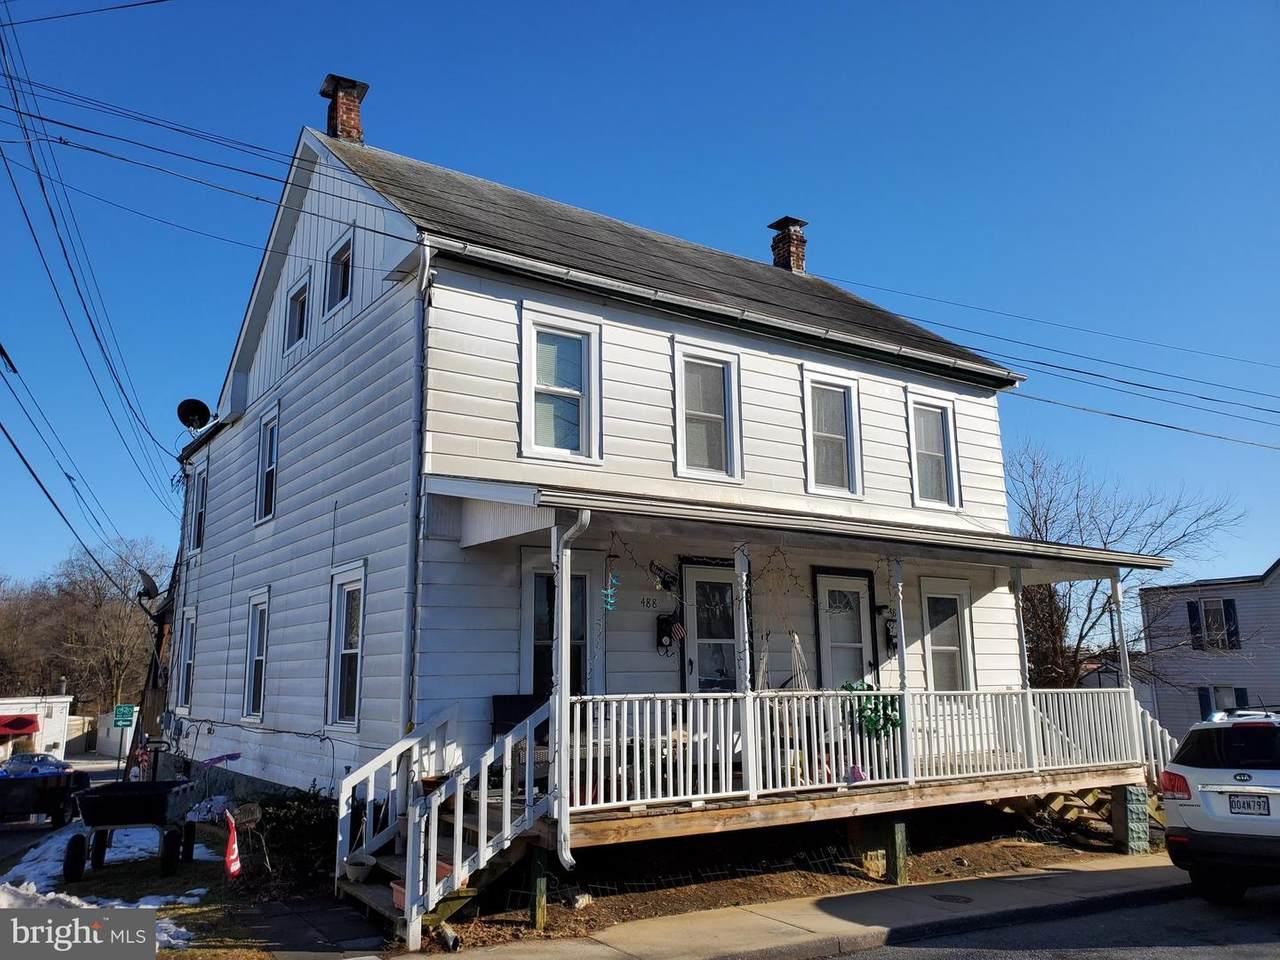 486 -488 Mcdowell Avenue - Photo 1